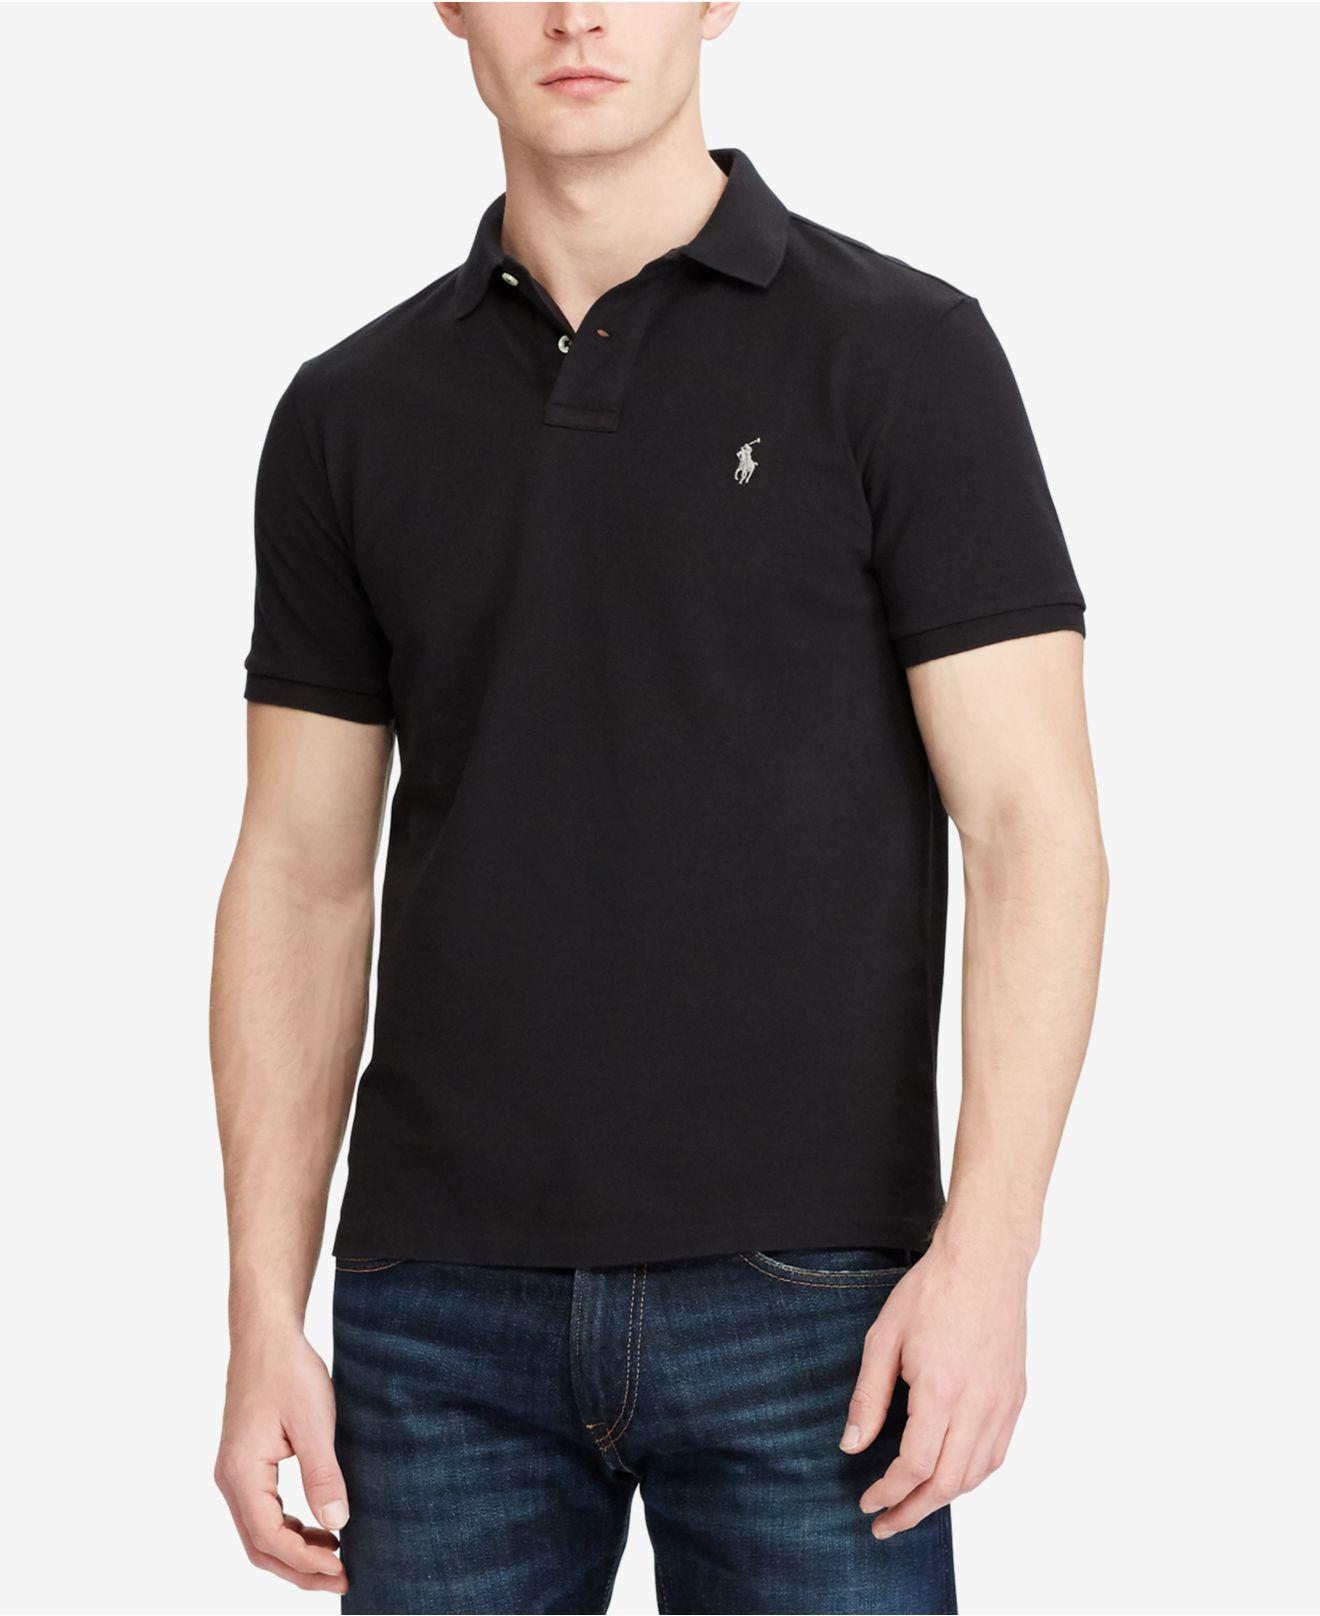 Lyst Polo Ralph Lauren Slim Fit Short Sleeve Polo Shirt In Black